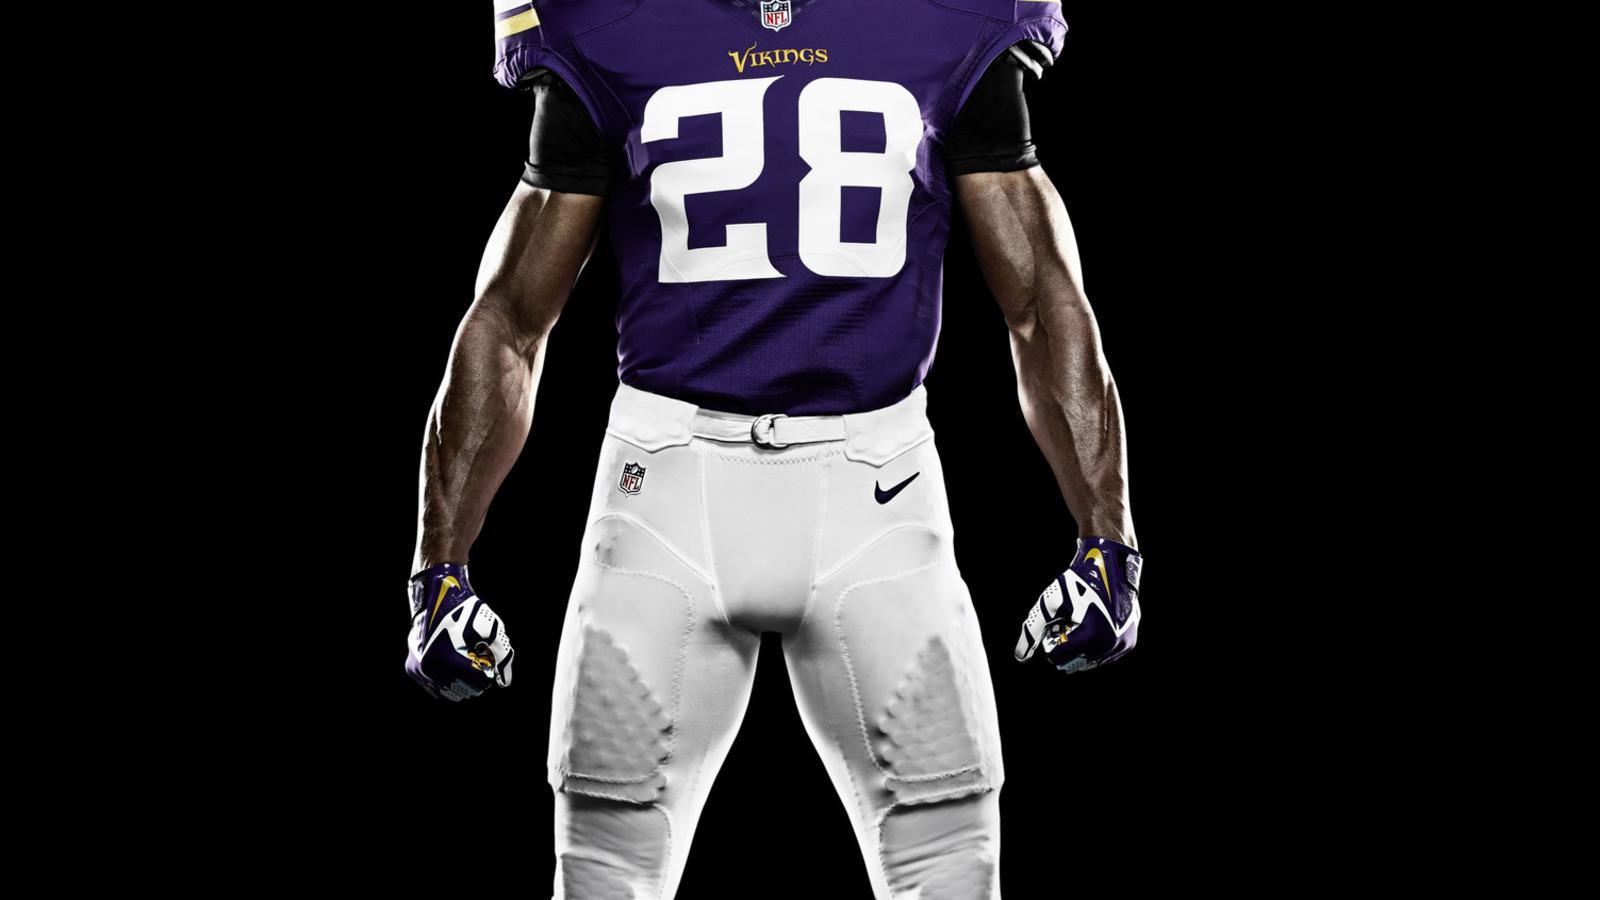 Jerseys NFL Wholesale - Nike News - Minnesota Vikings and Nike Unveil New Uniform Design ...